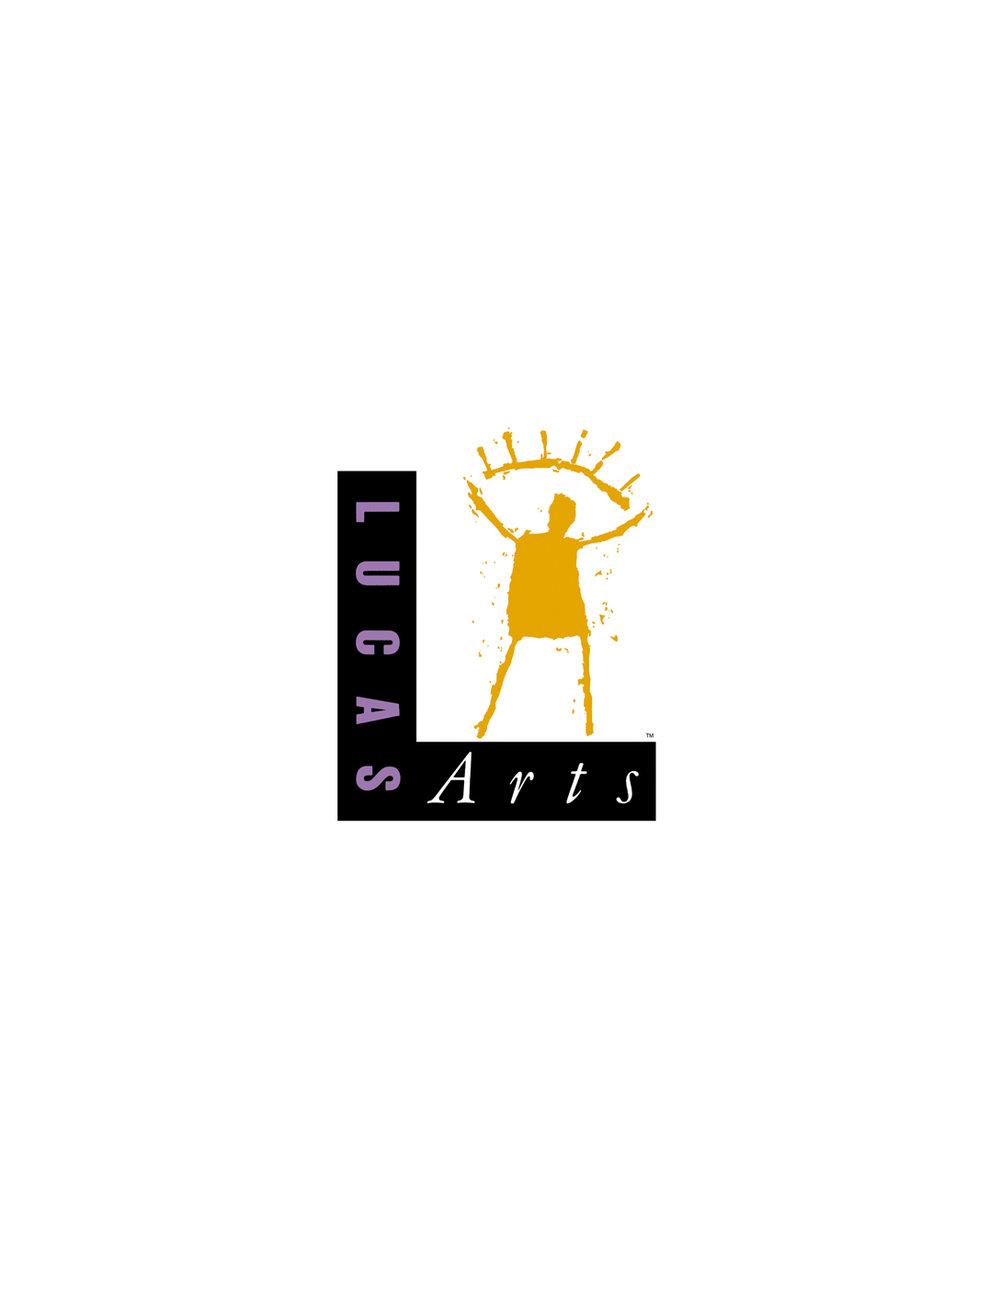 Lucasarts.logo.jpg